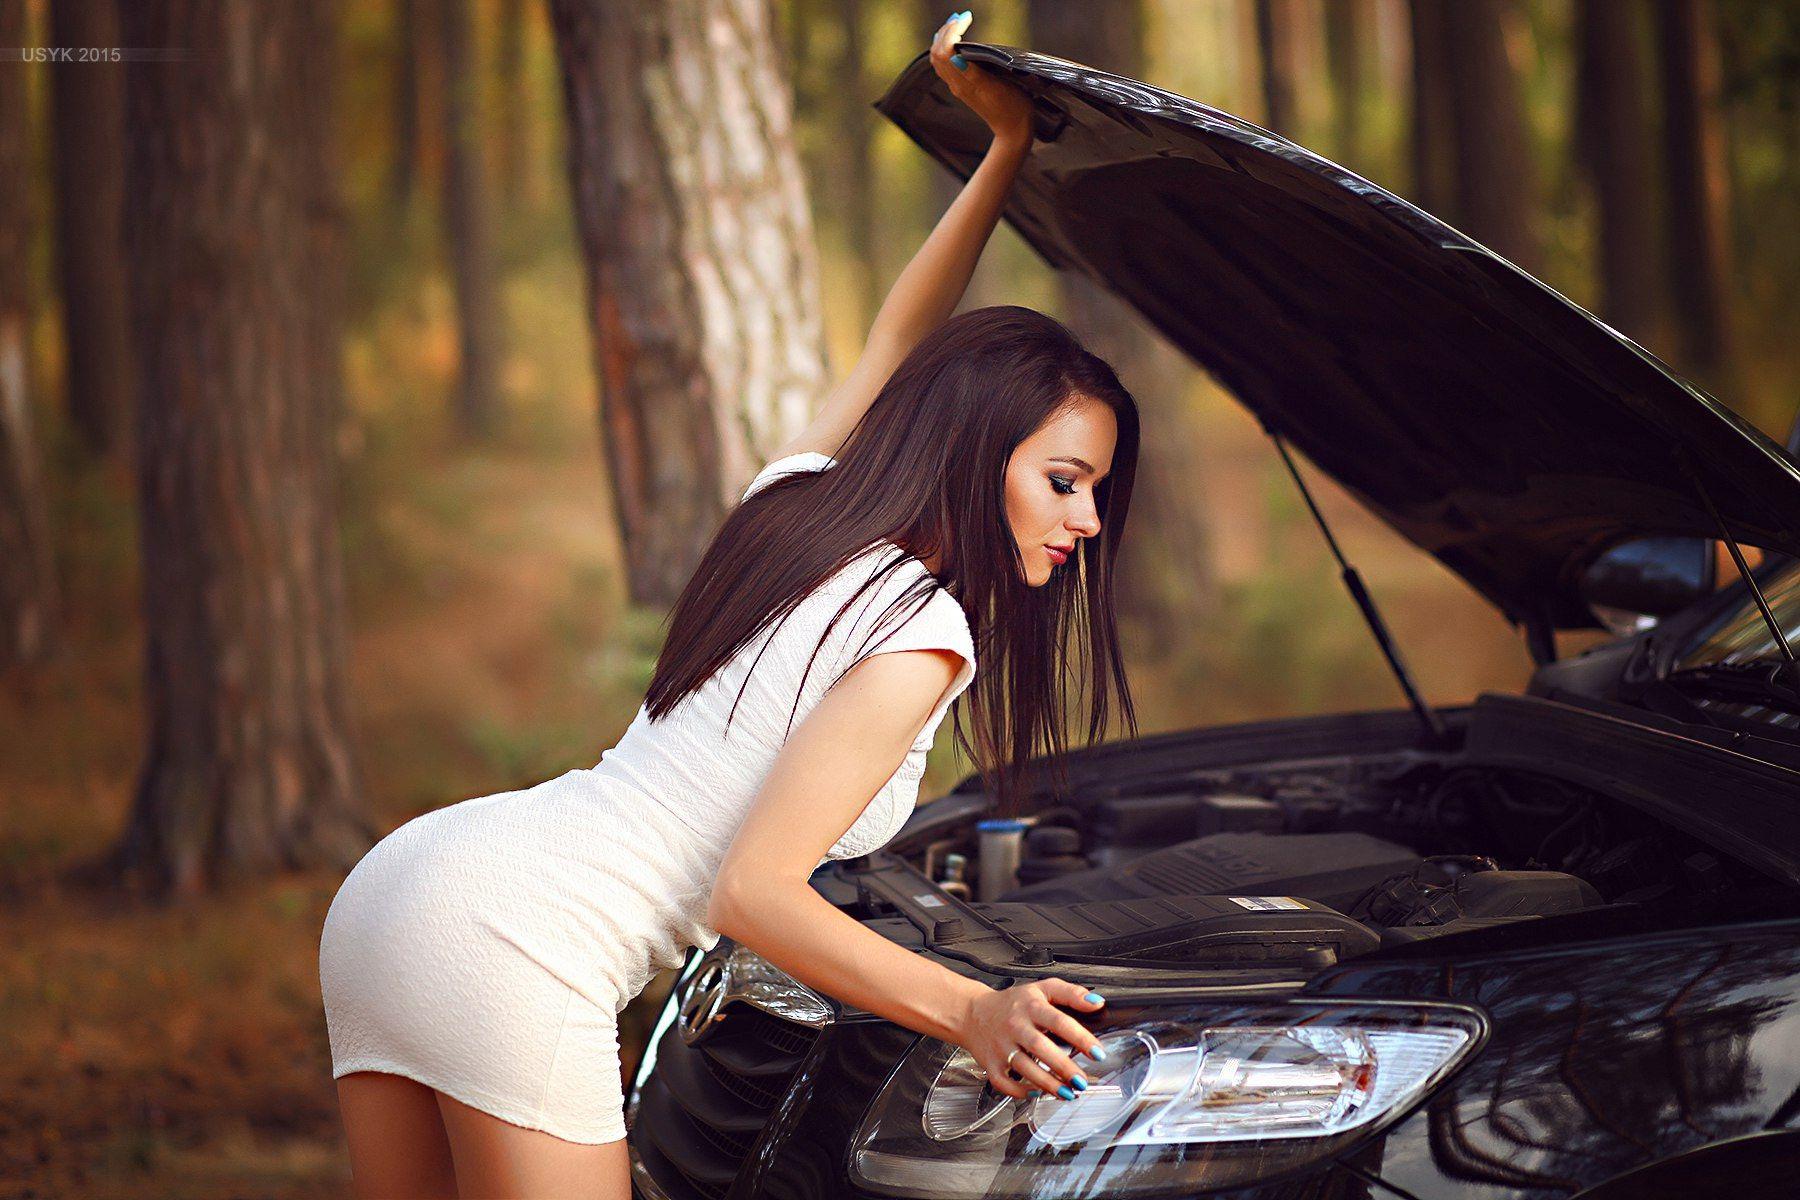 Girls And Stunning Cars Hd Wallpapers 2019 Outdoor Woman Bikini Car Wash Pit Girls